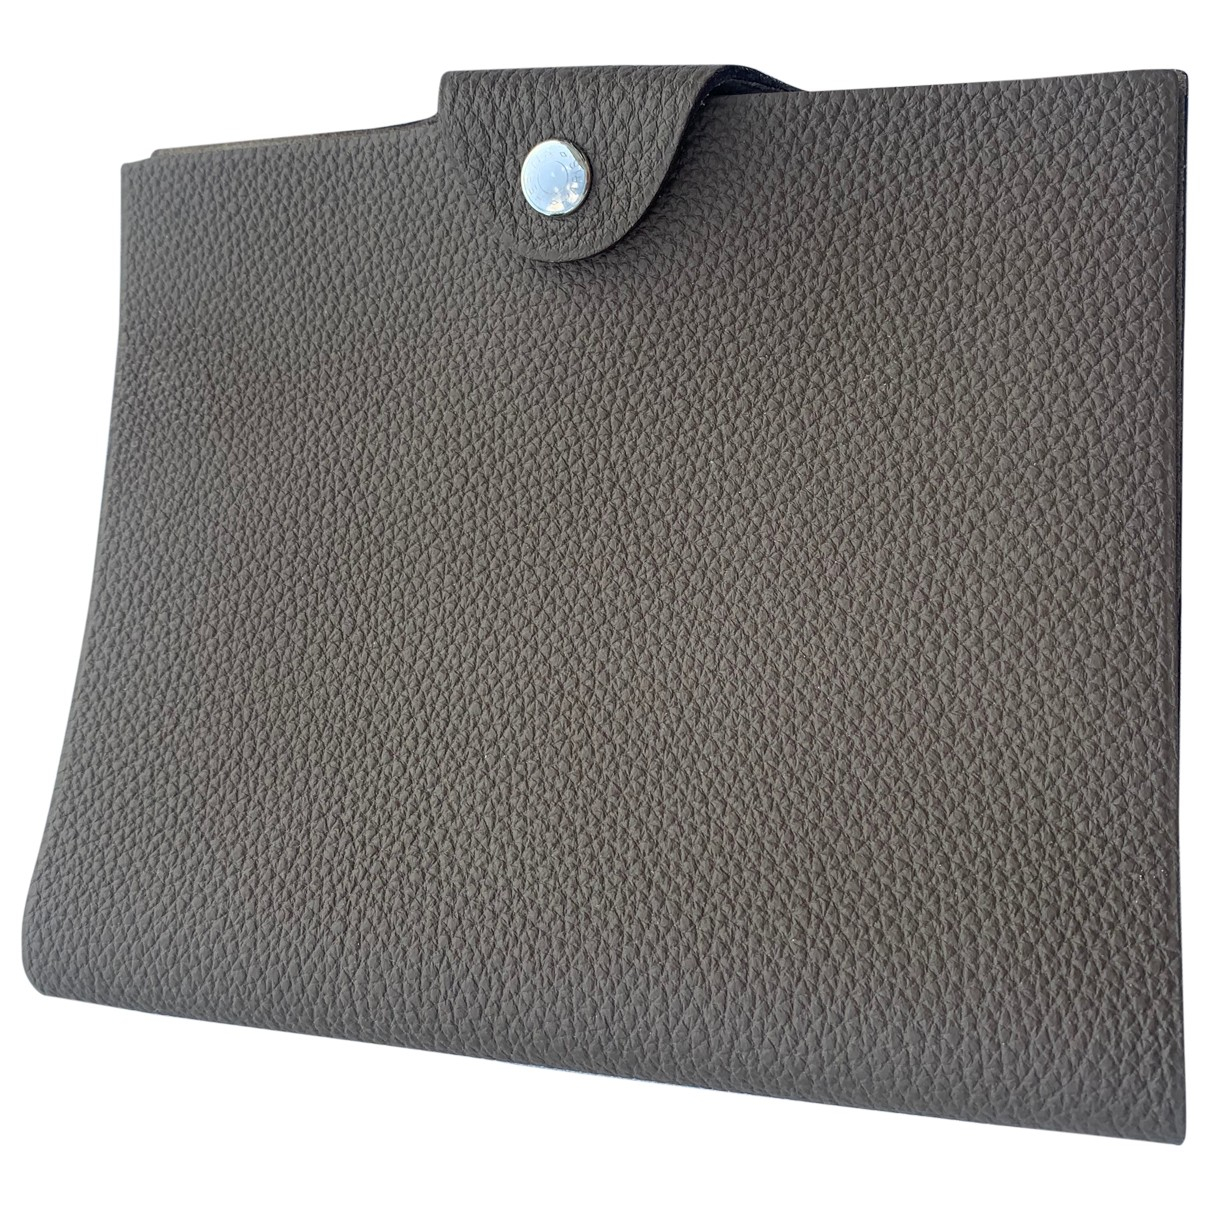 Hermes - Objets & Deco Ulysse MM pour lifestyle en cuir